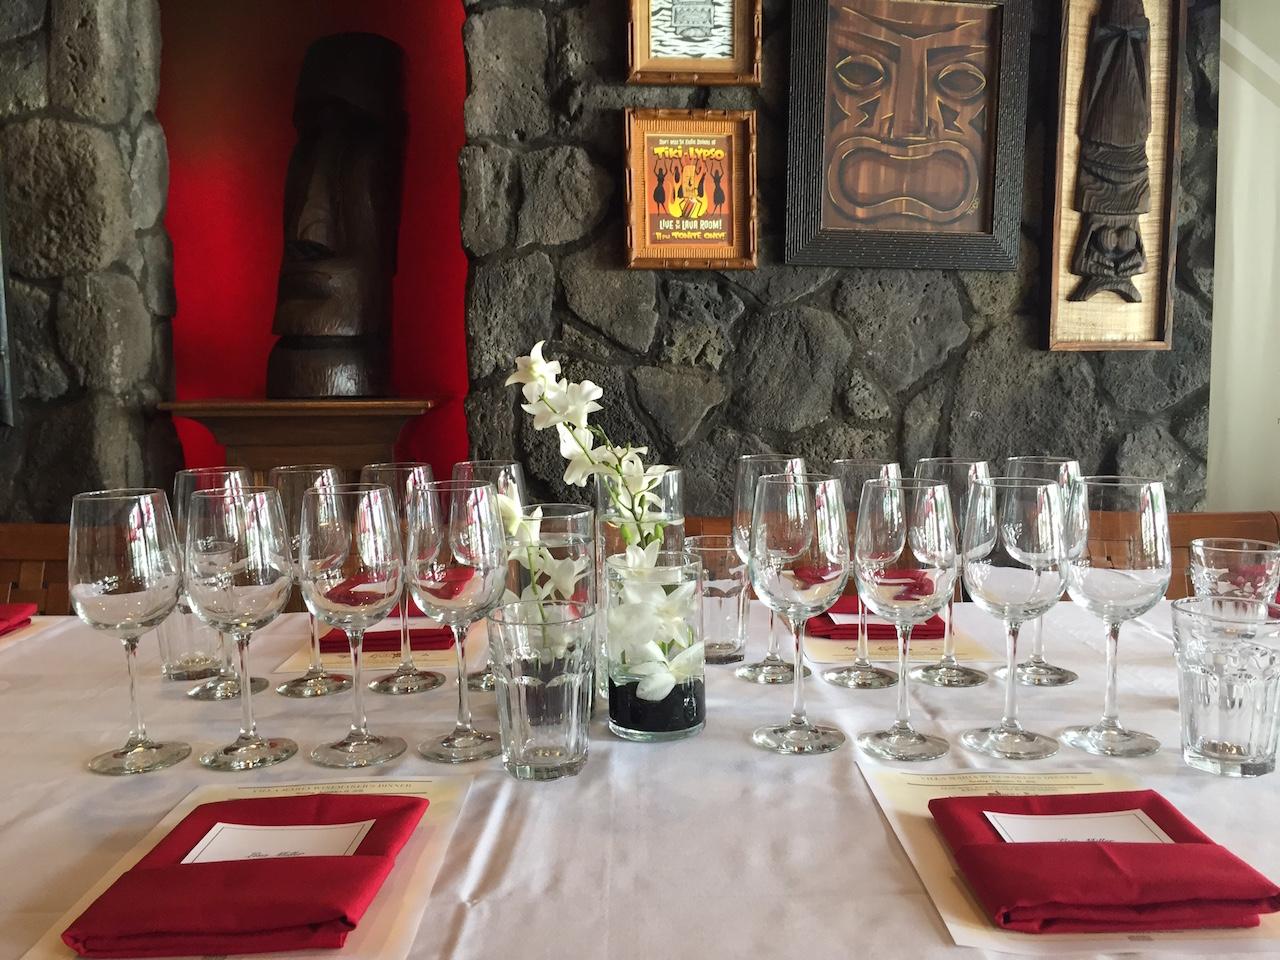 Tiki's Grill & Bar Wine Dinner Table Setting